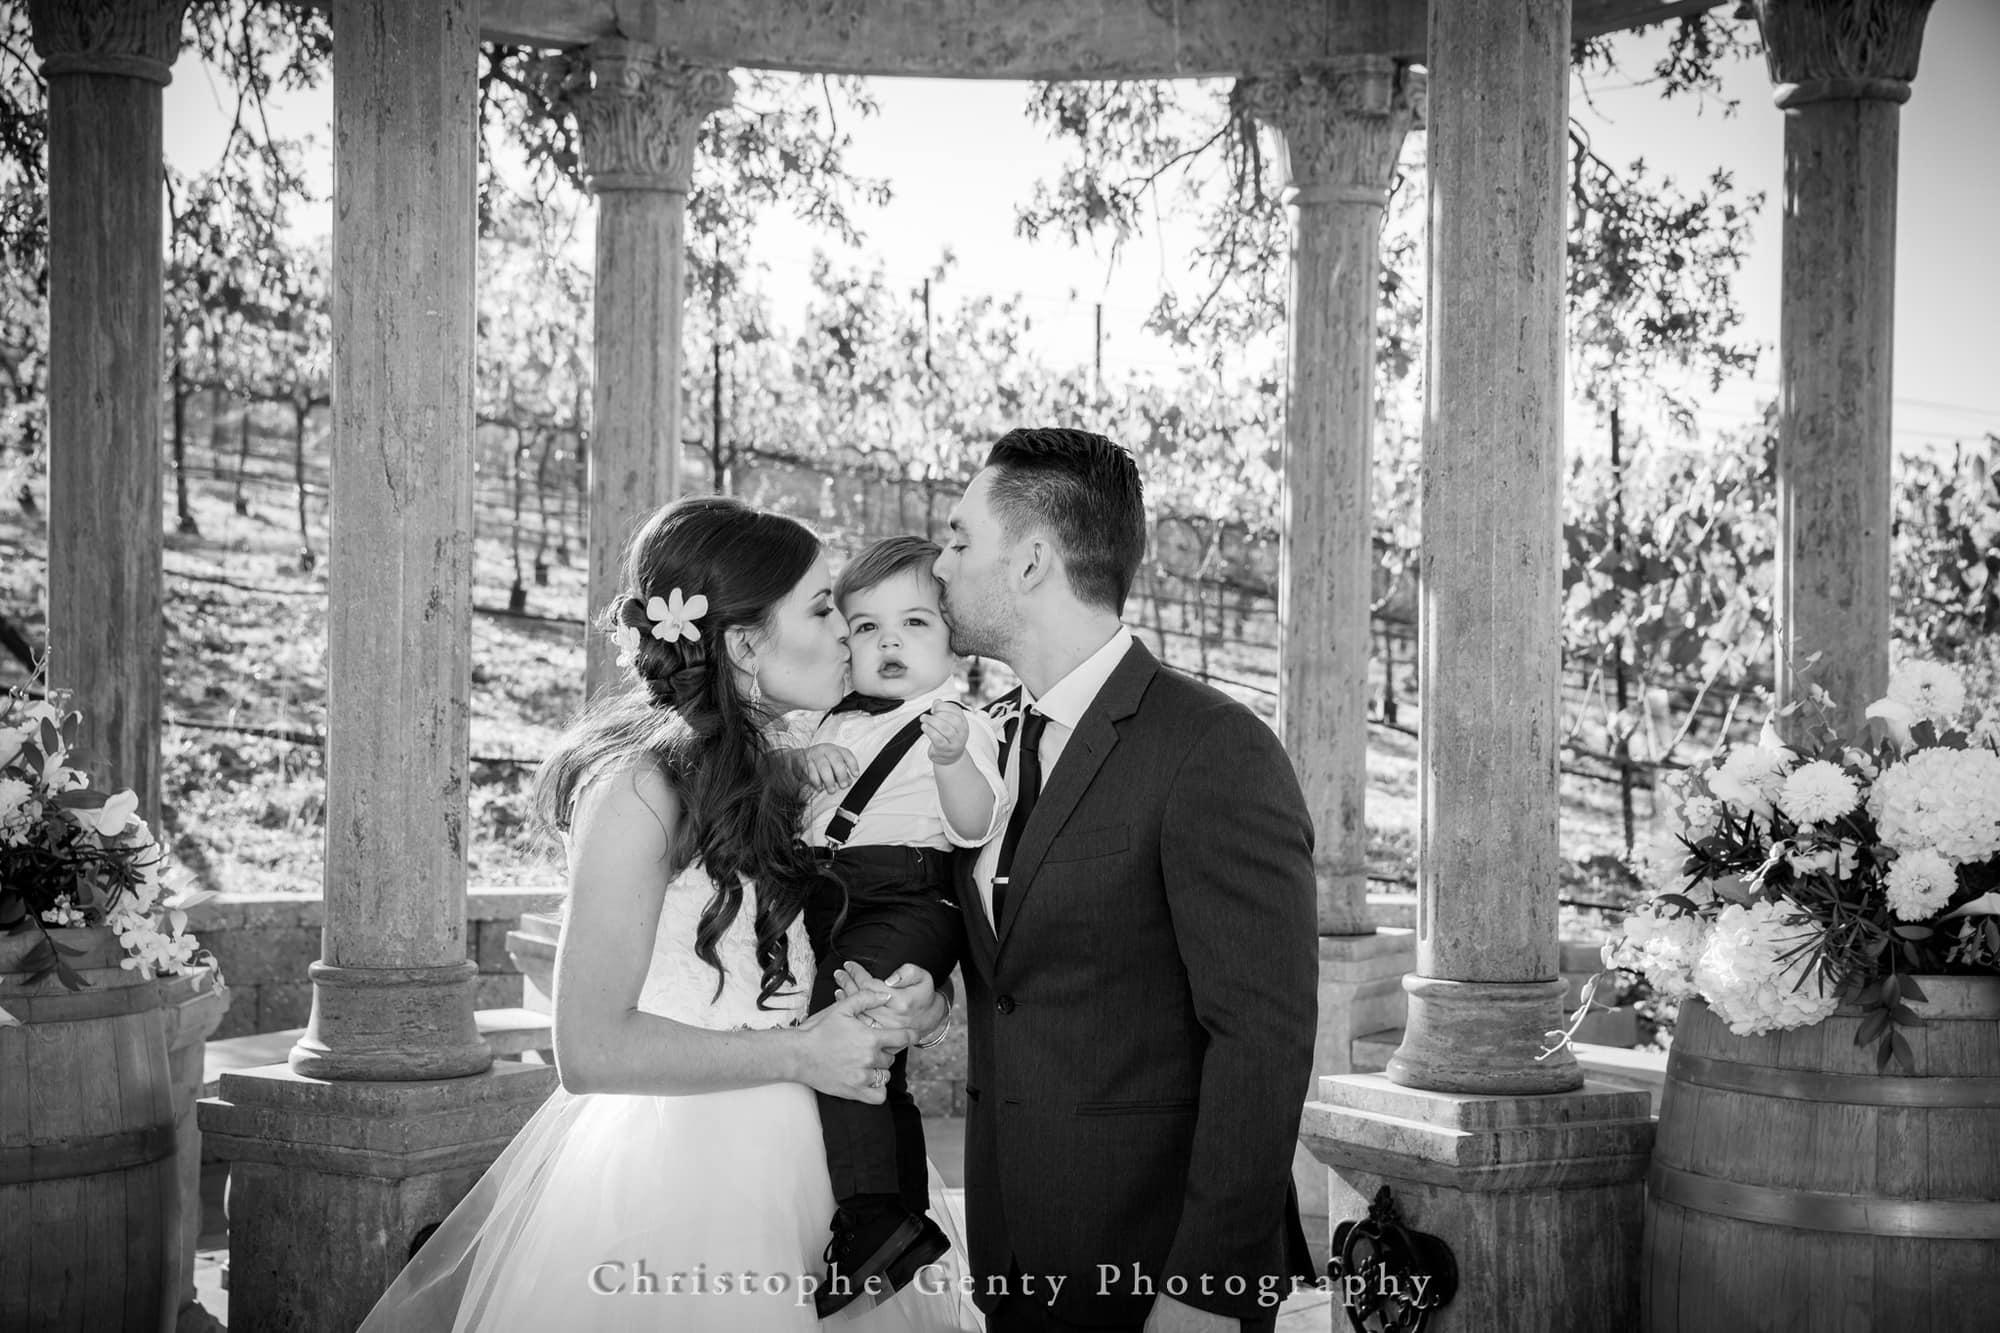 WeddingWedding Photography at The Meritage Inn & Spa, Napa CA